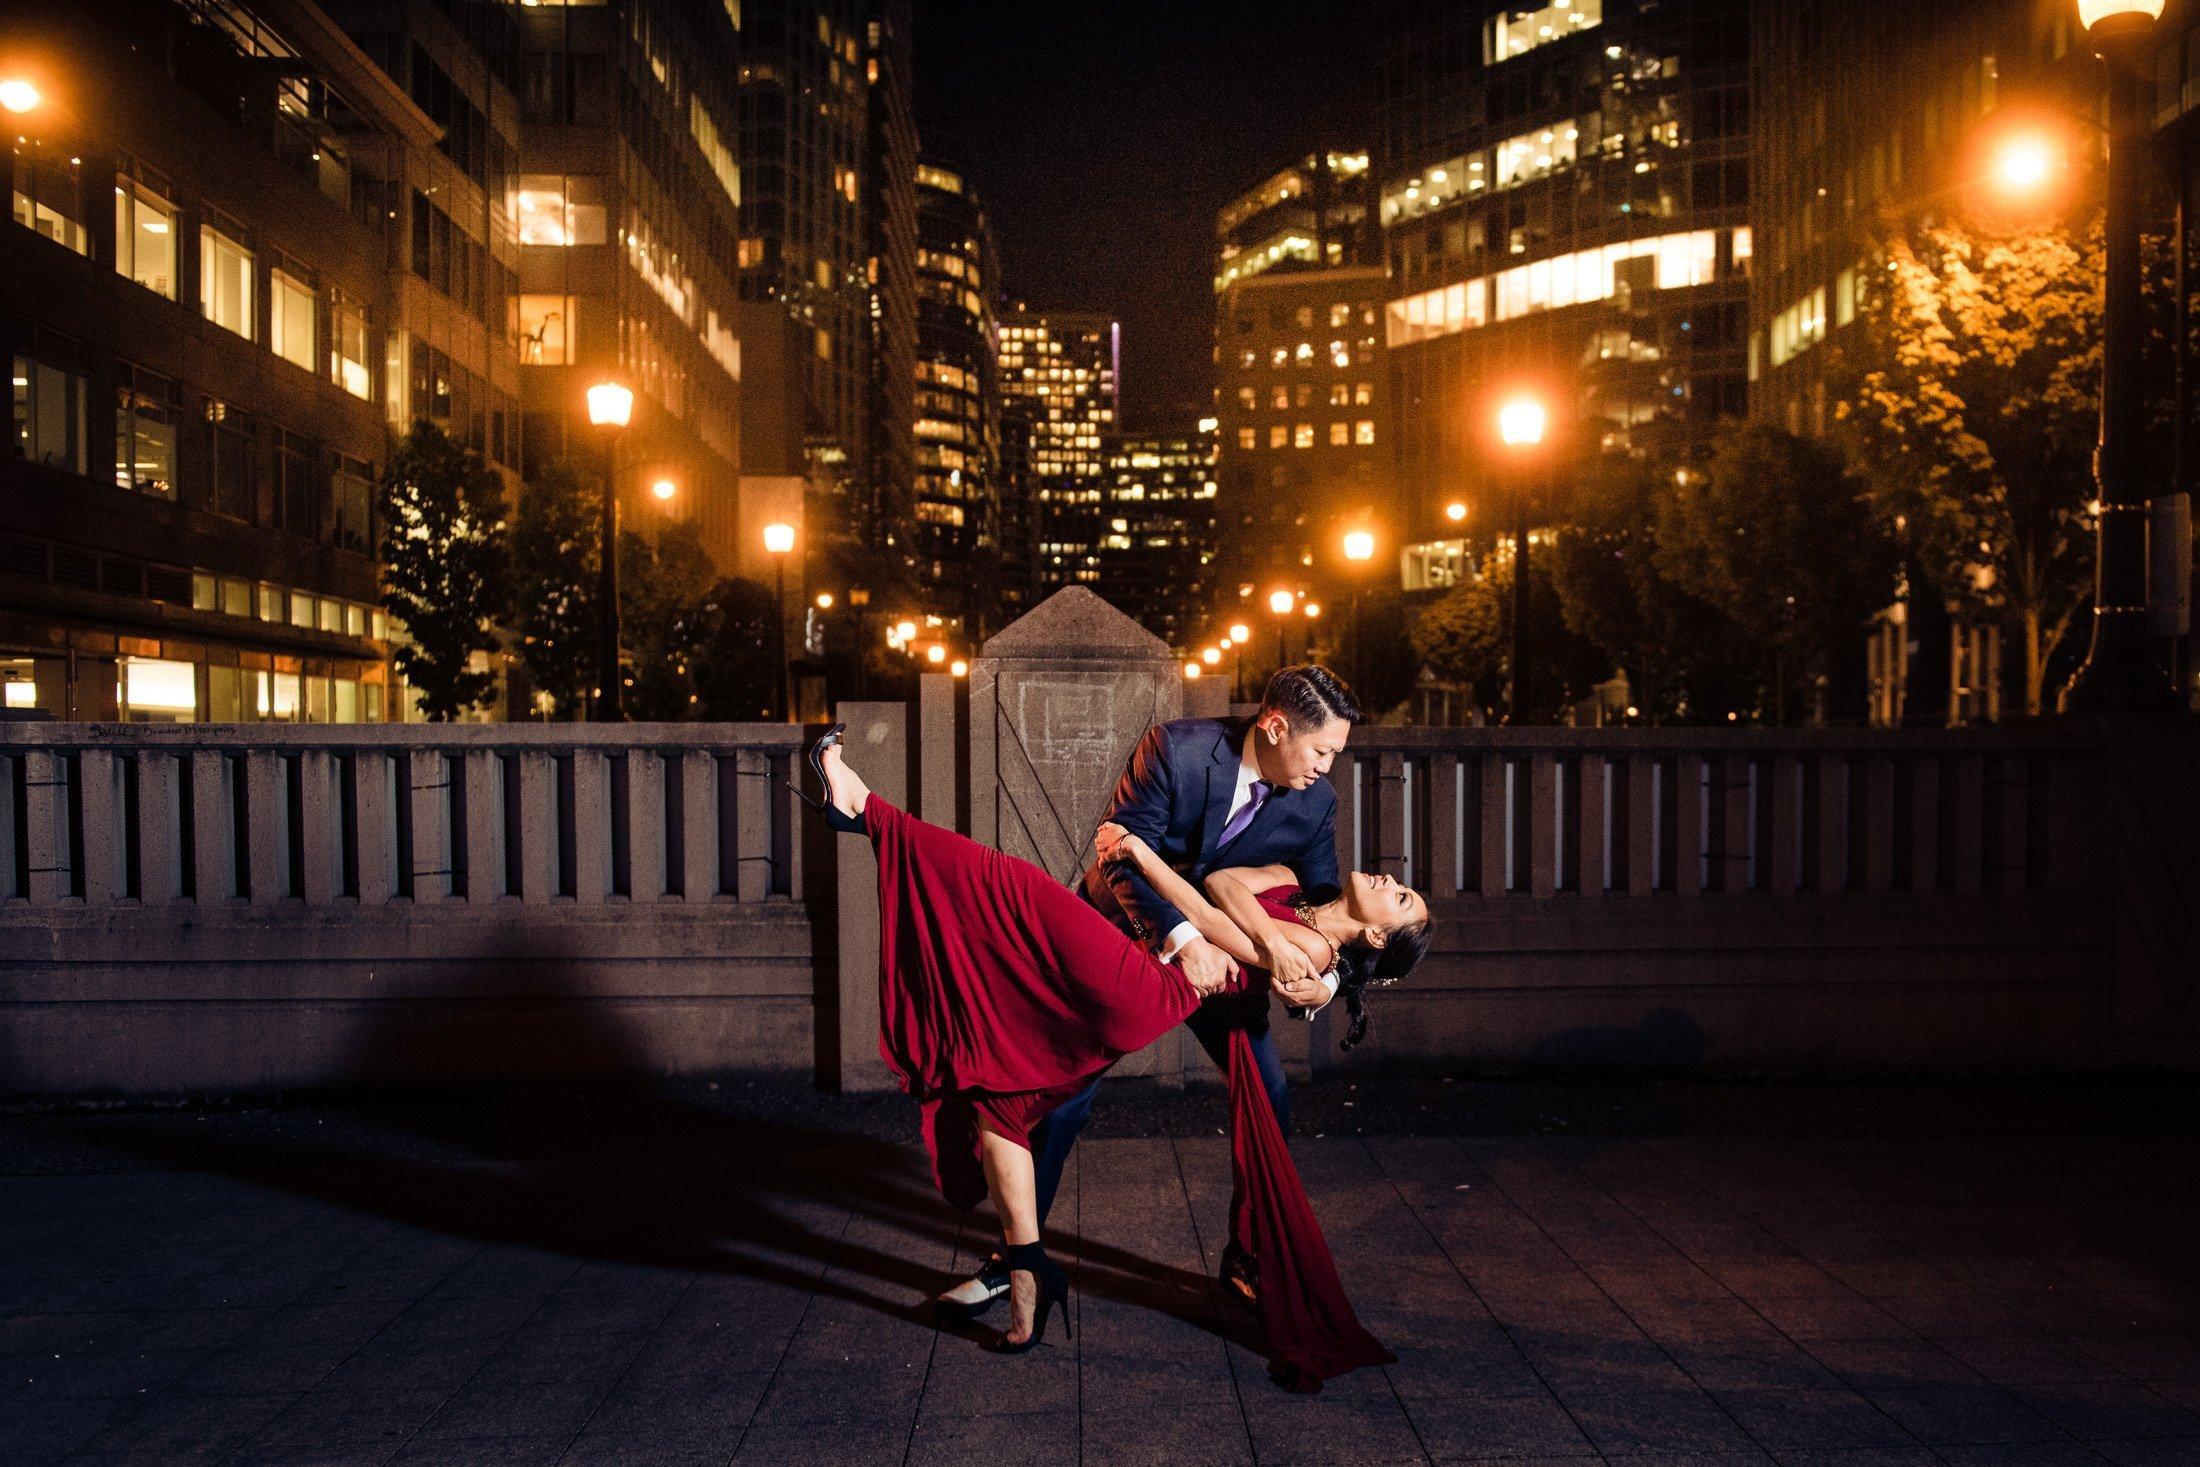 036 - night city wedding photos vancouver